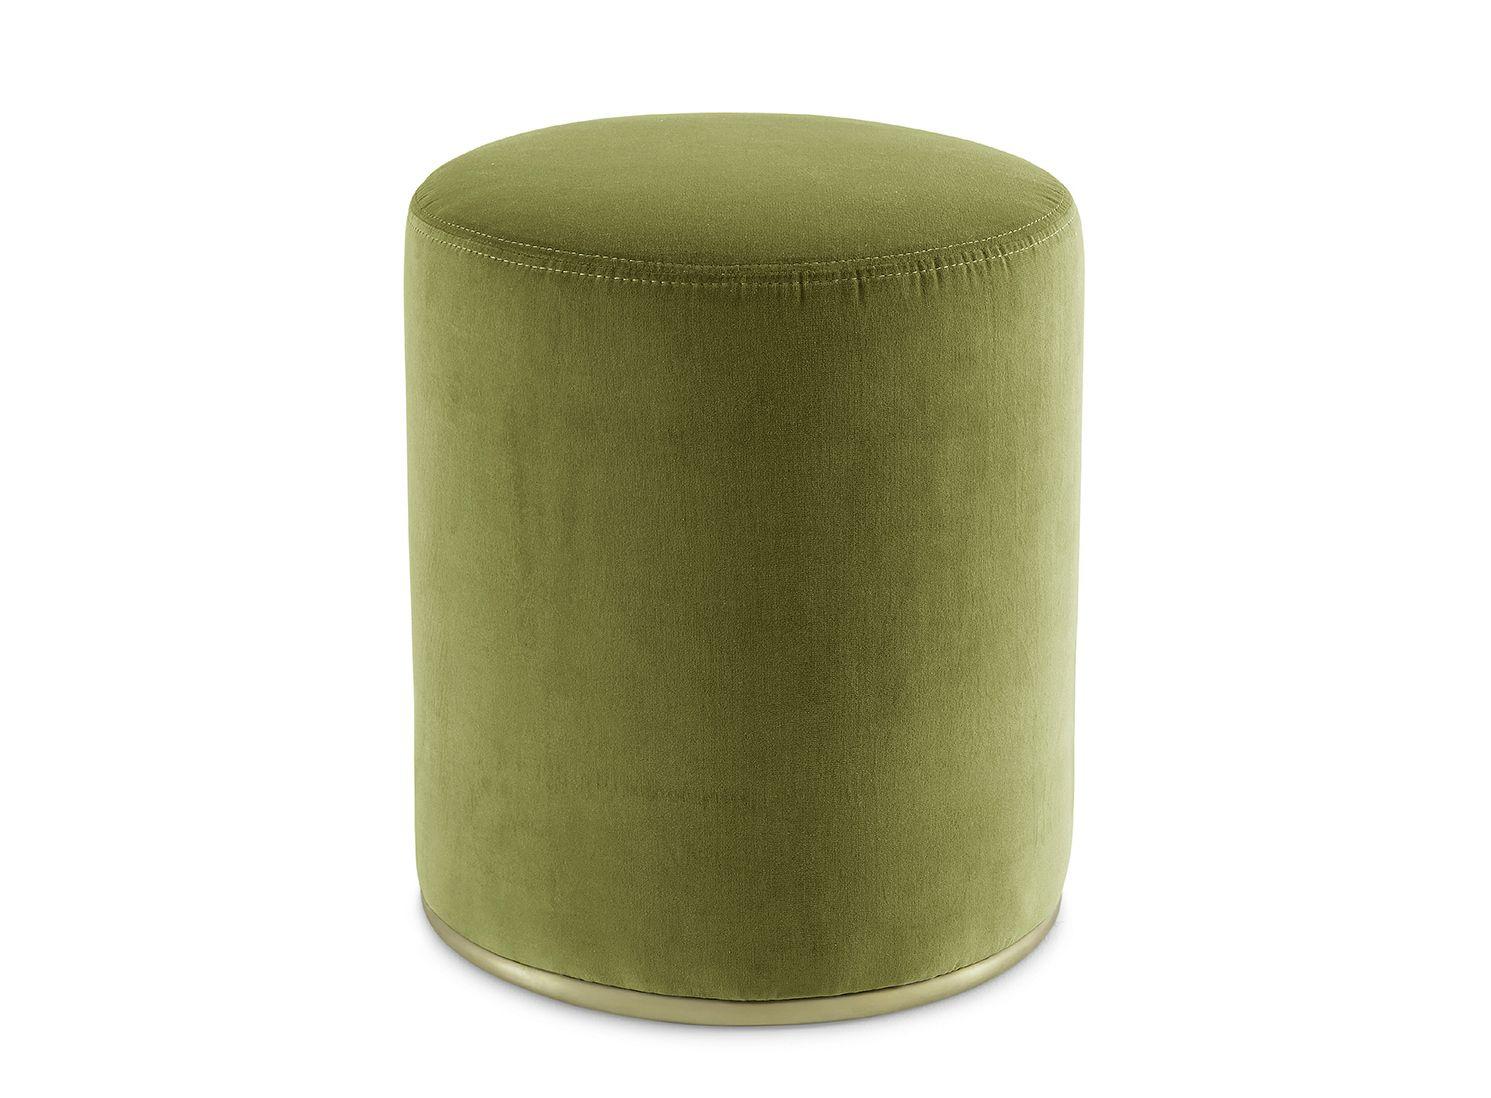 pouf rembourr en velours lou by gallotti radice design studio g r. Black Bedroom Furniture Sets. Home Design Ideas